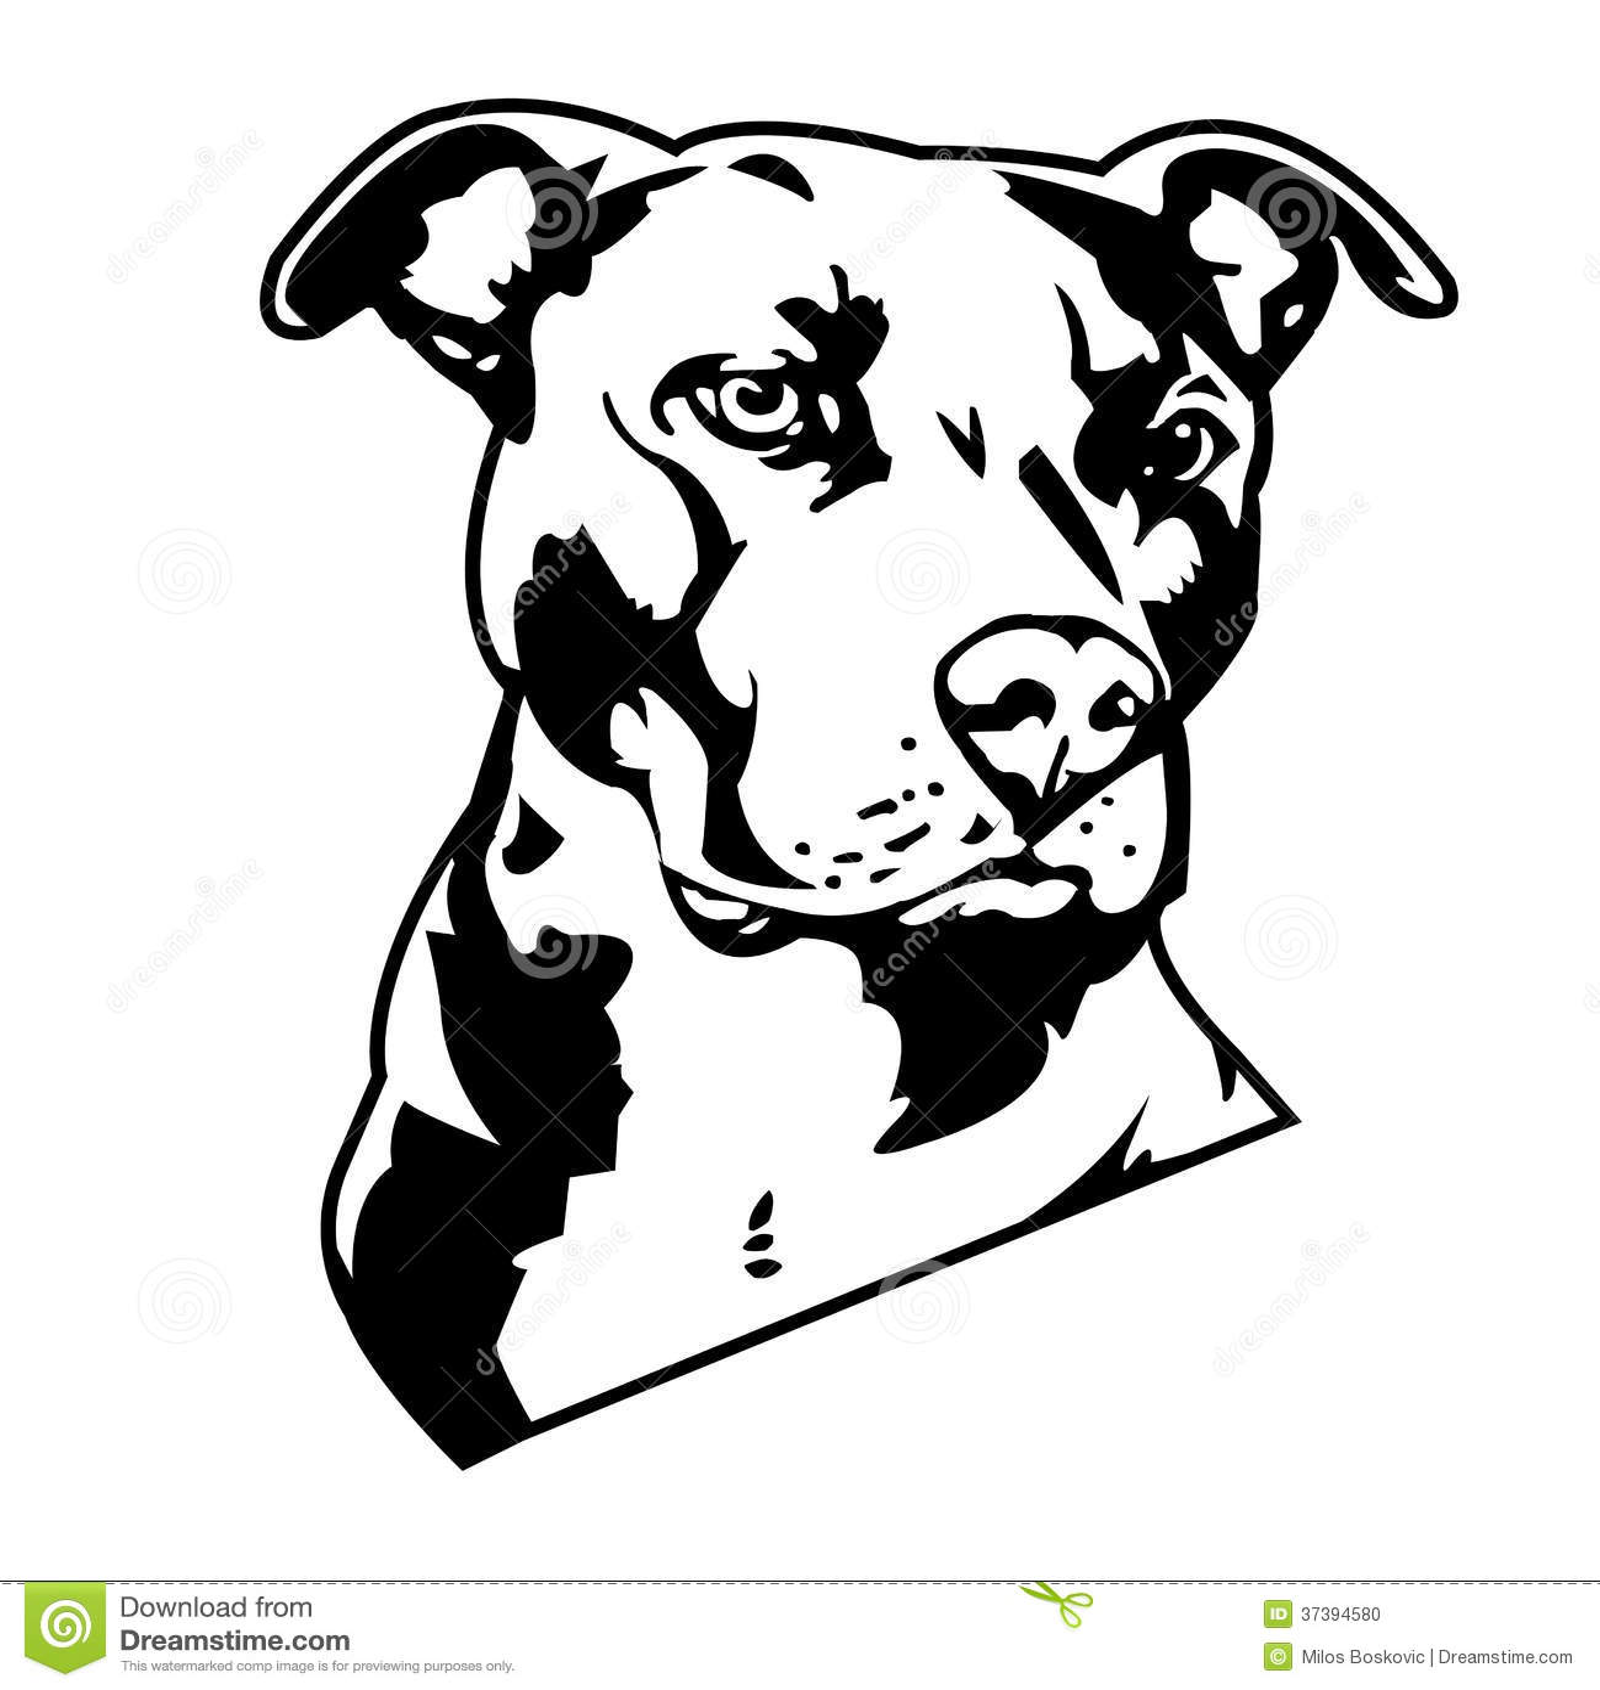 pit bulls wallpaper free